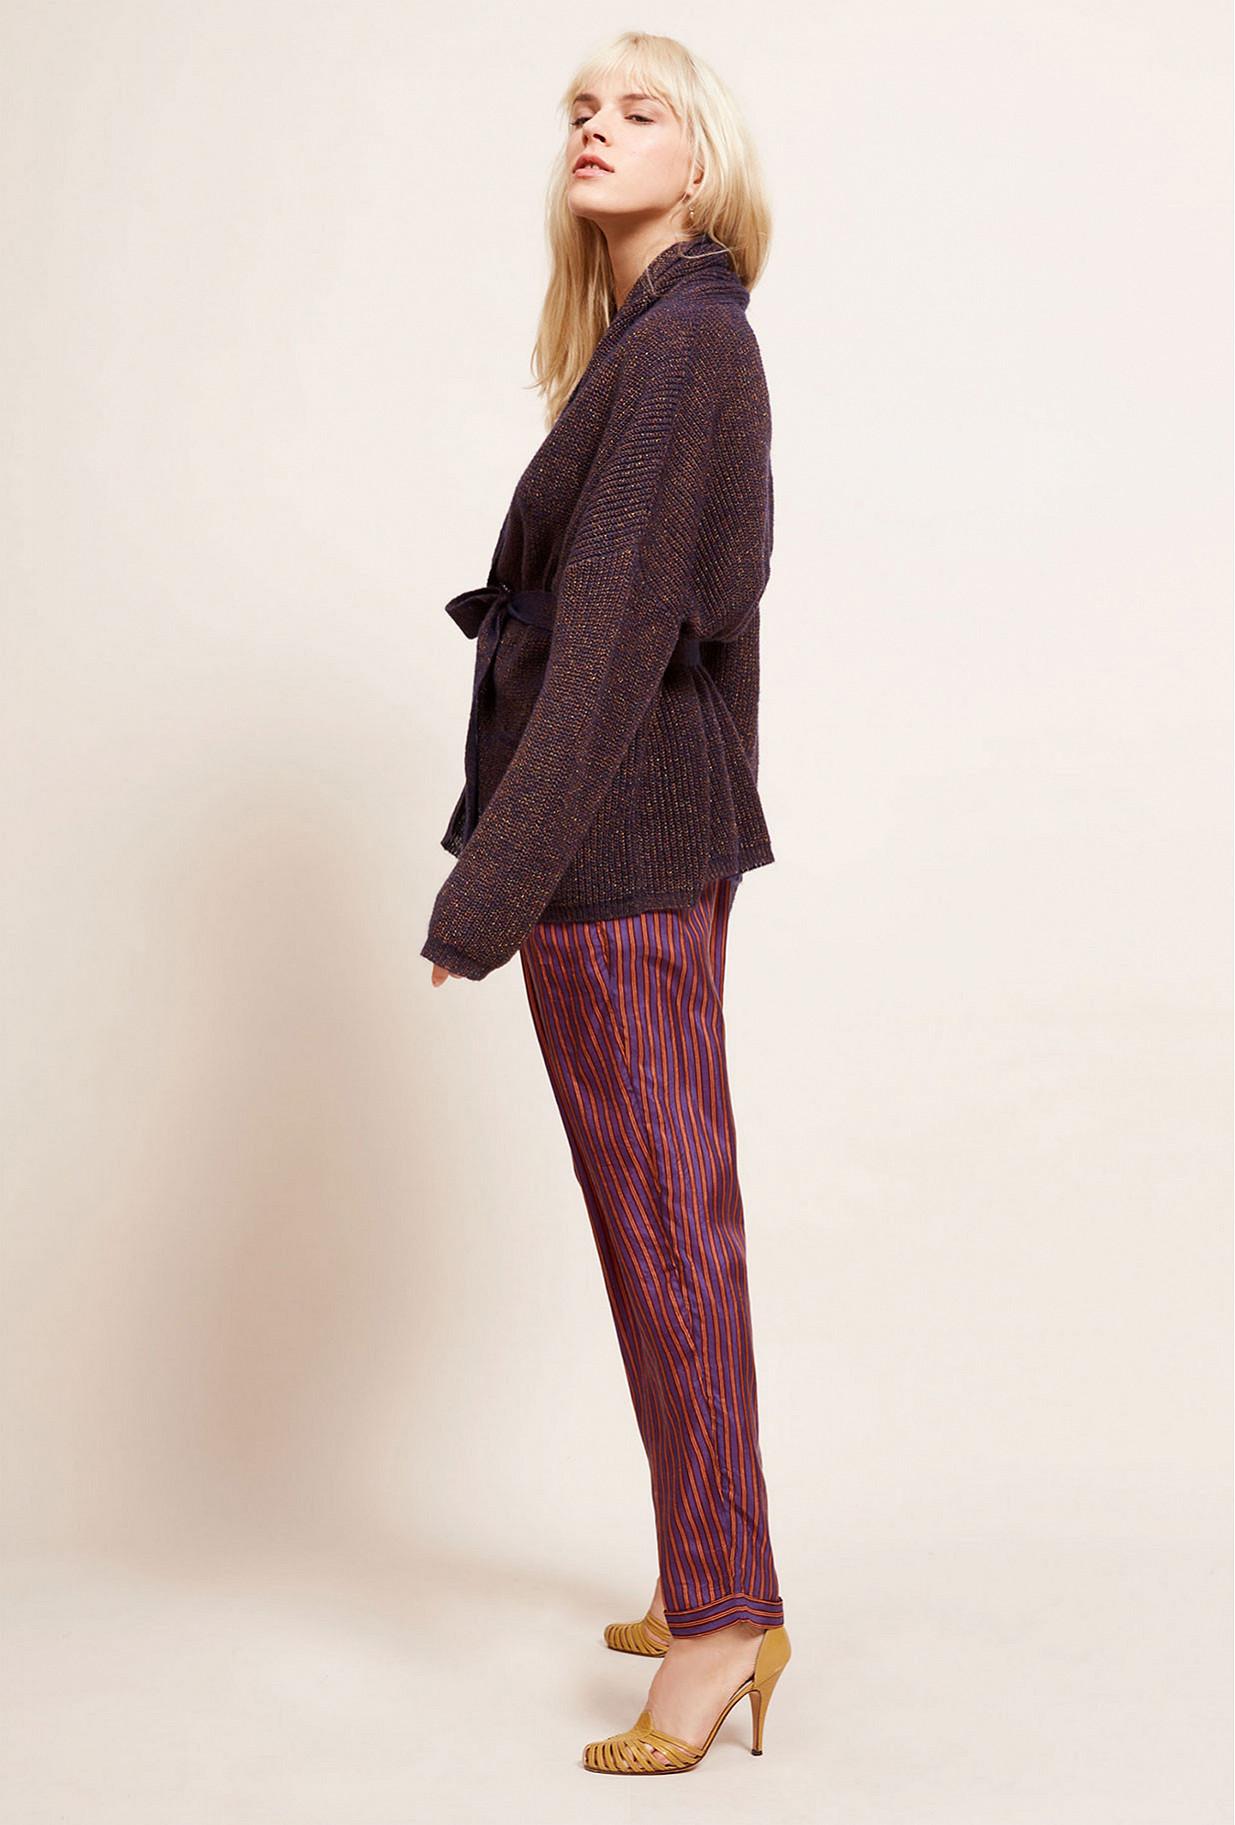 Paris clothes store Cardigan  Scapa french designer fashion Paris